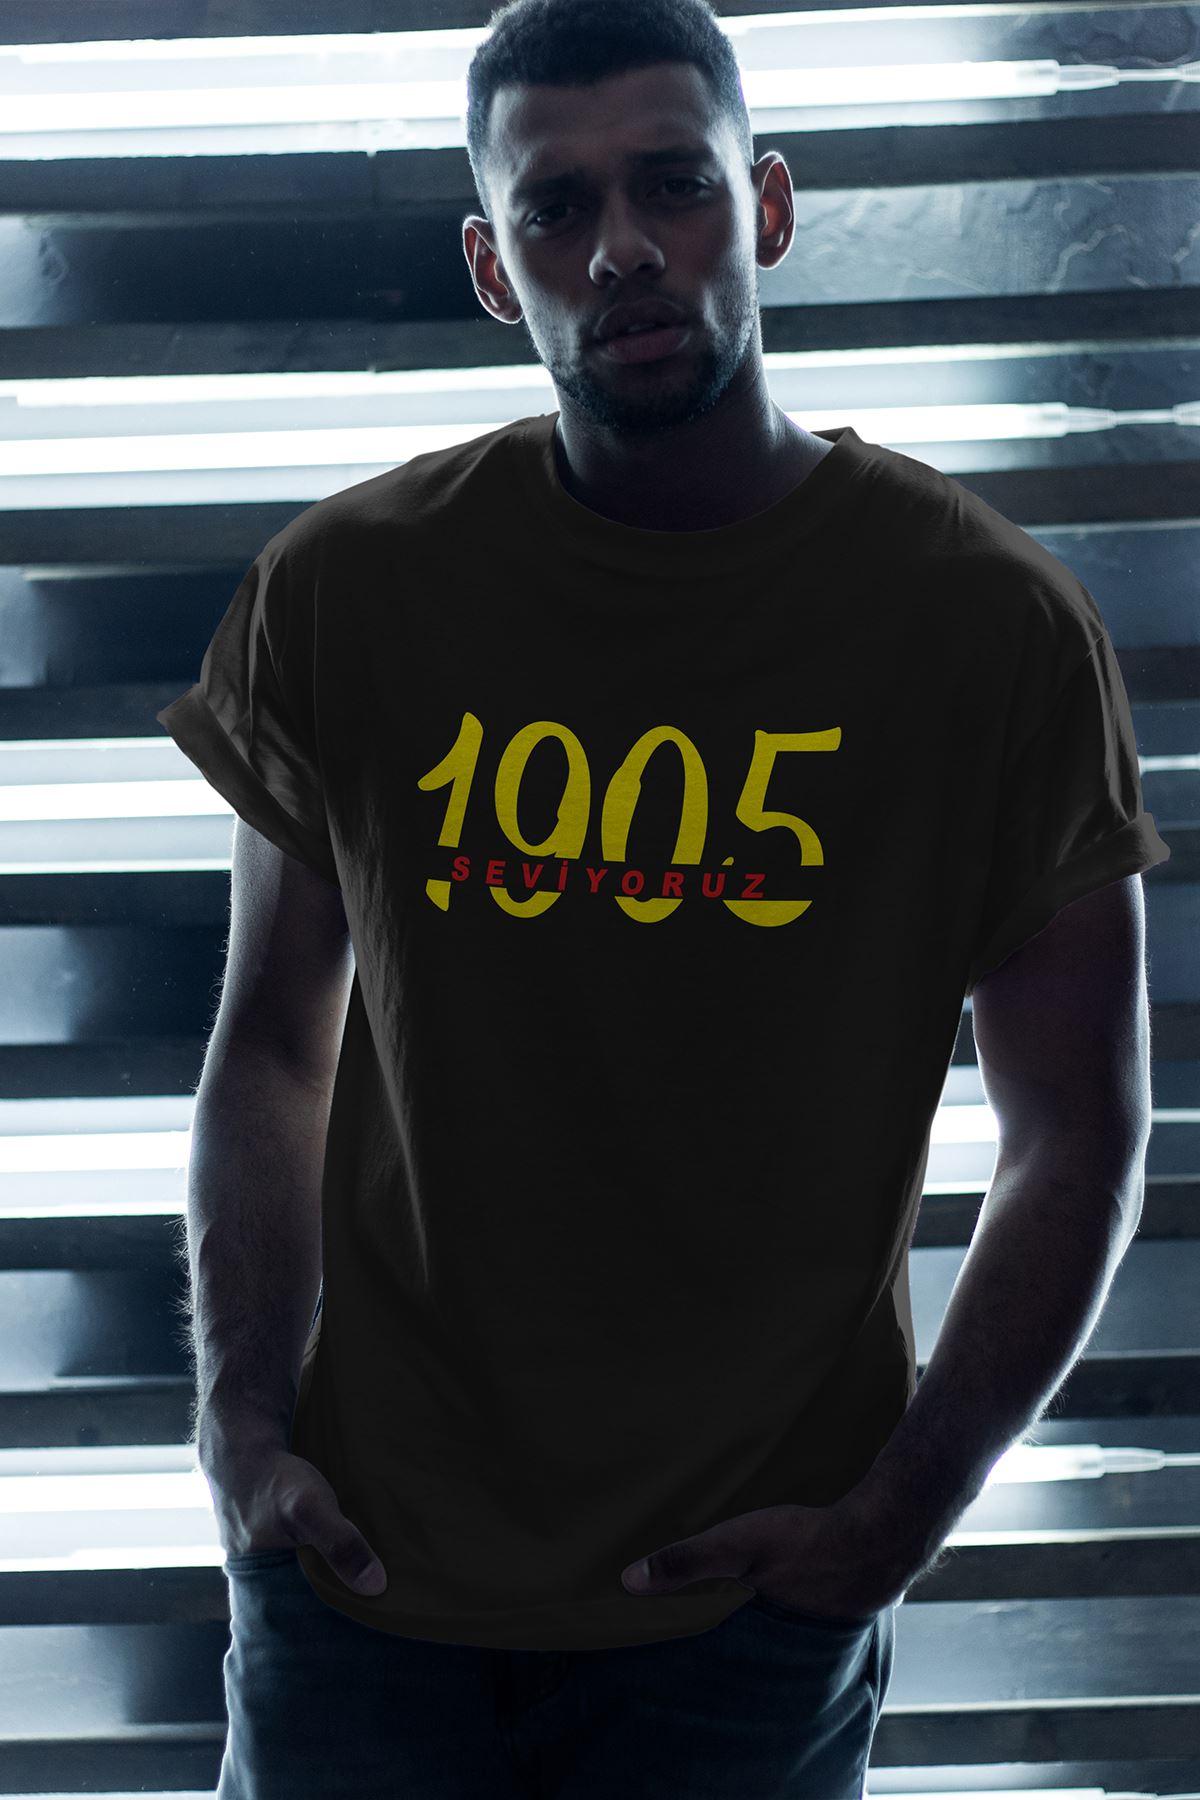 1905-2 GS Siyah Erkek Oversize Tshirt - Tişört